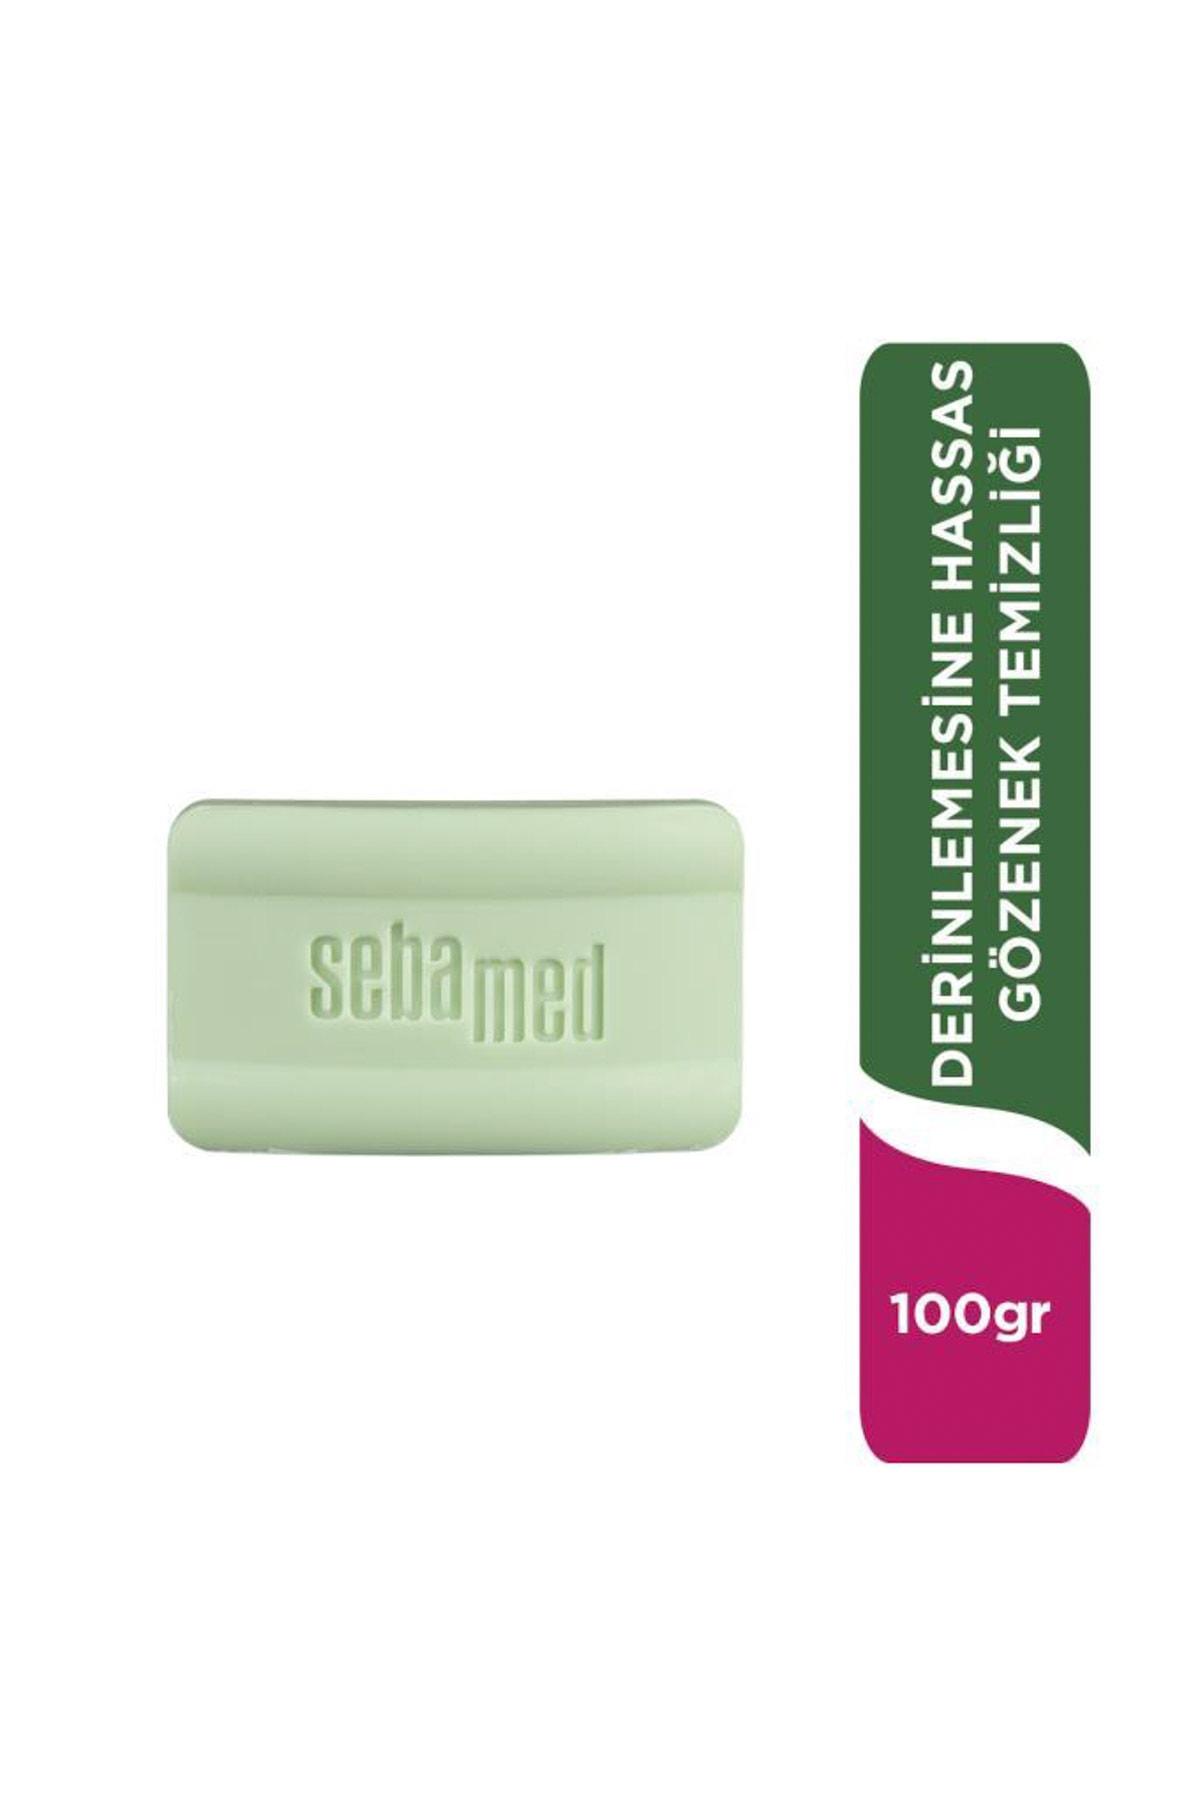 Sebamed Sabun Compact Cleansing Bar 100gr 1